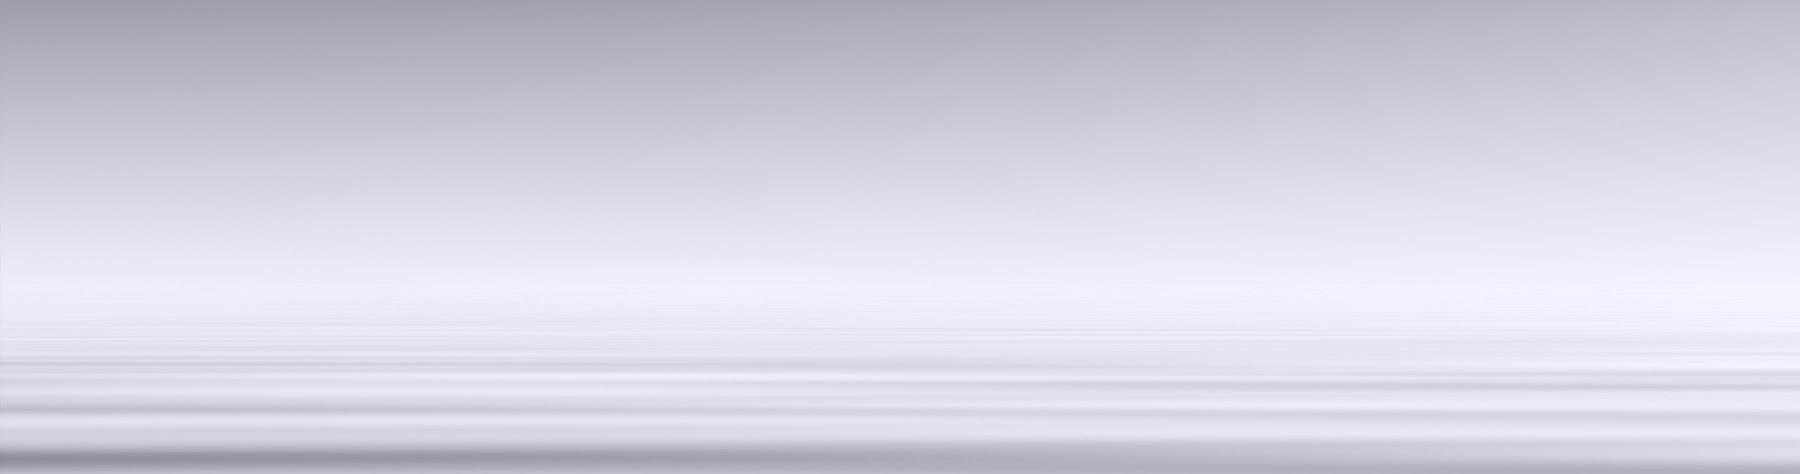 rotator full width background